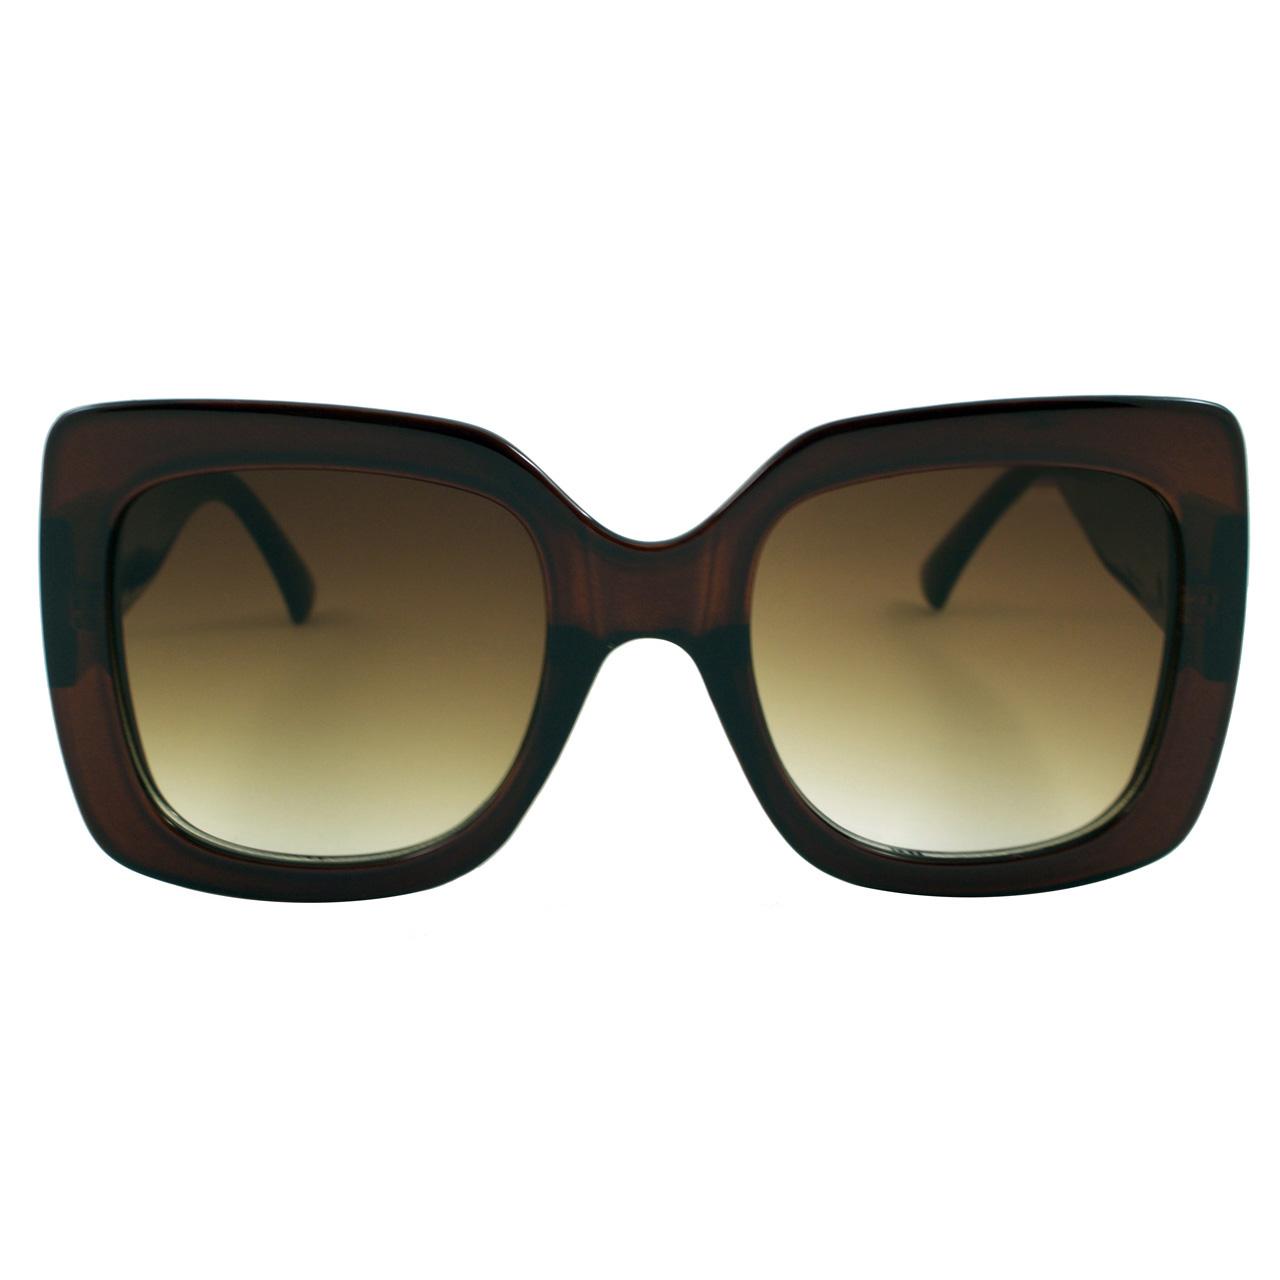 قیمت عینک آفتابی زنانه مدل Transparent Brown Bee Collection